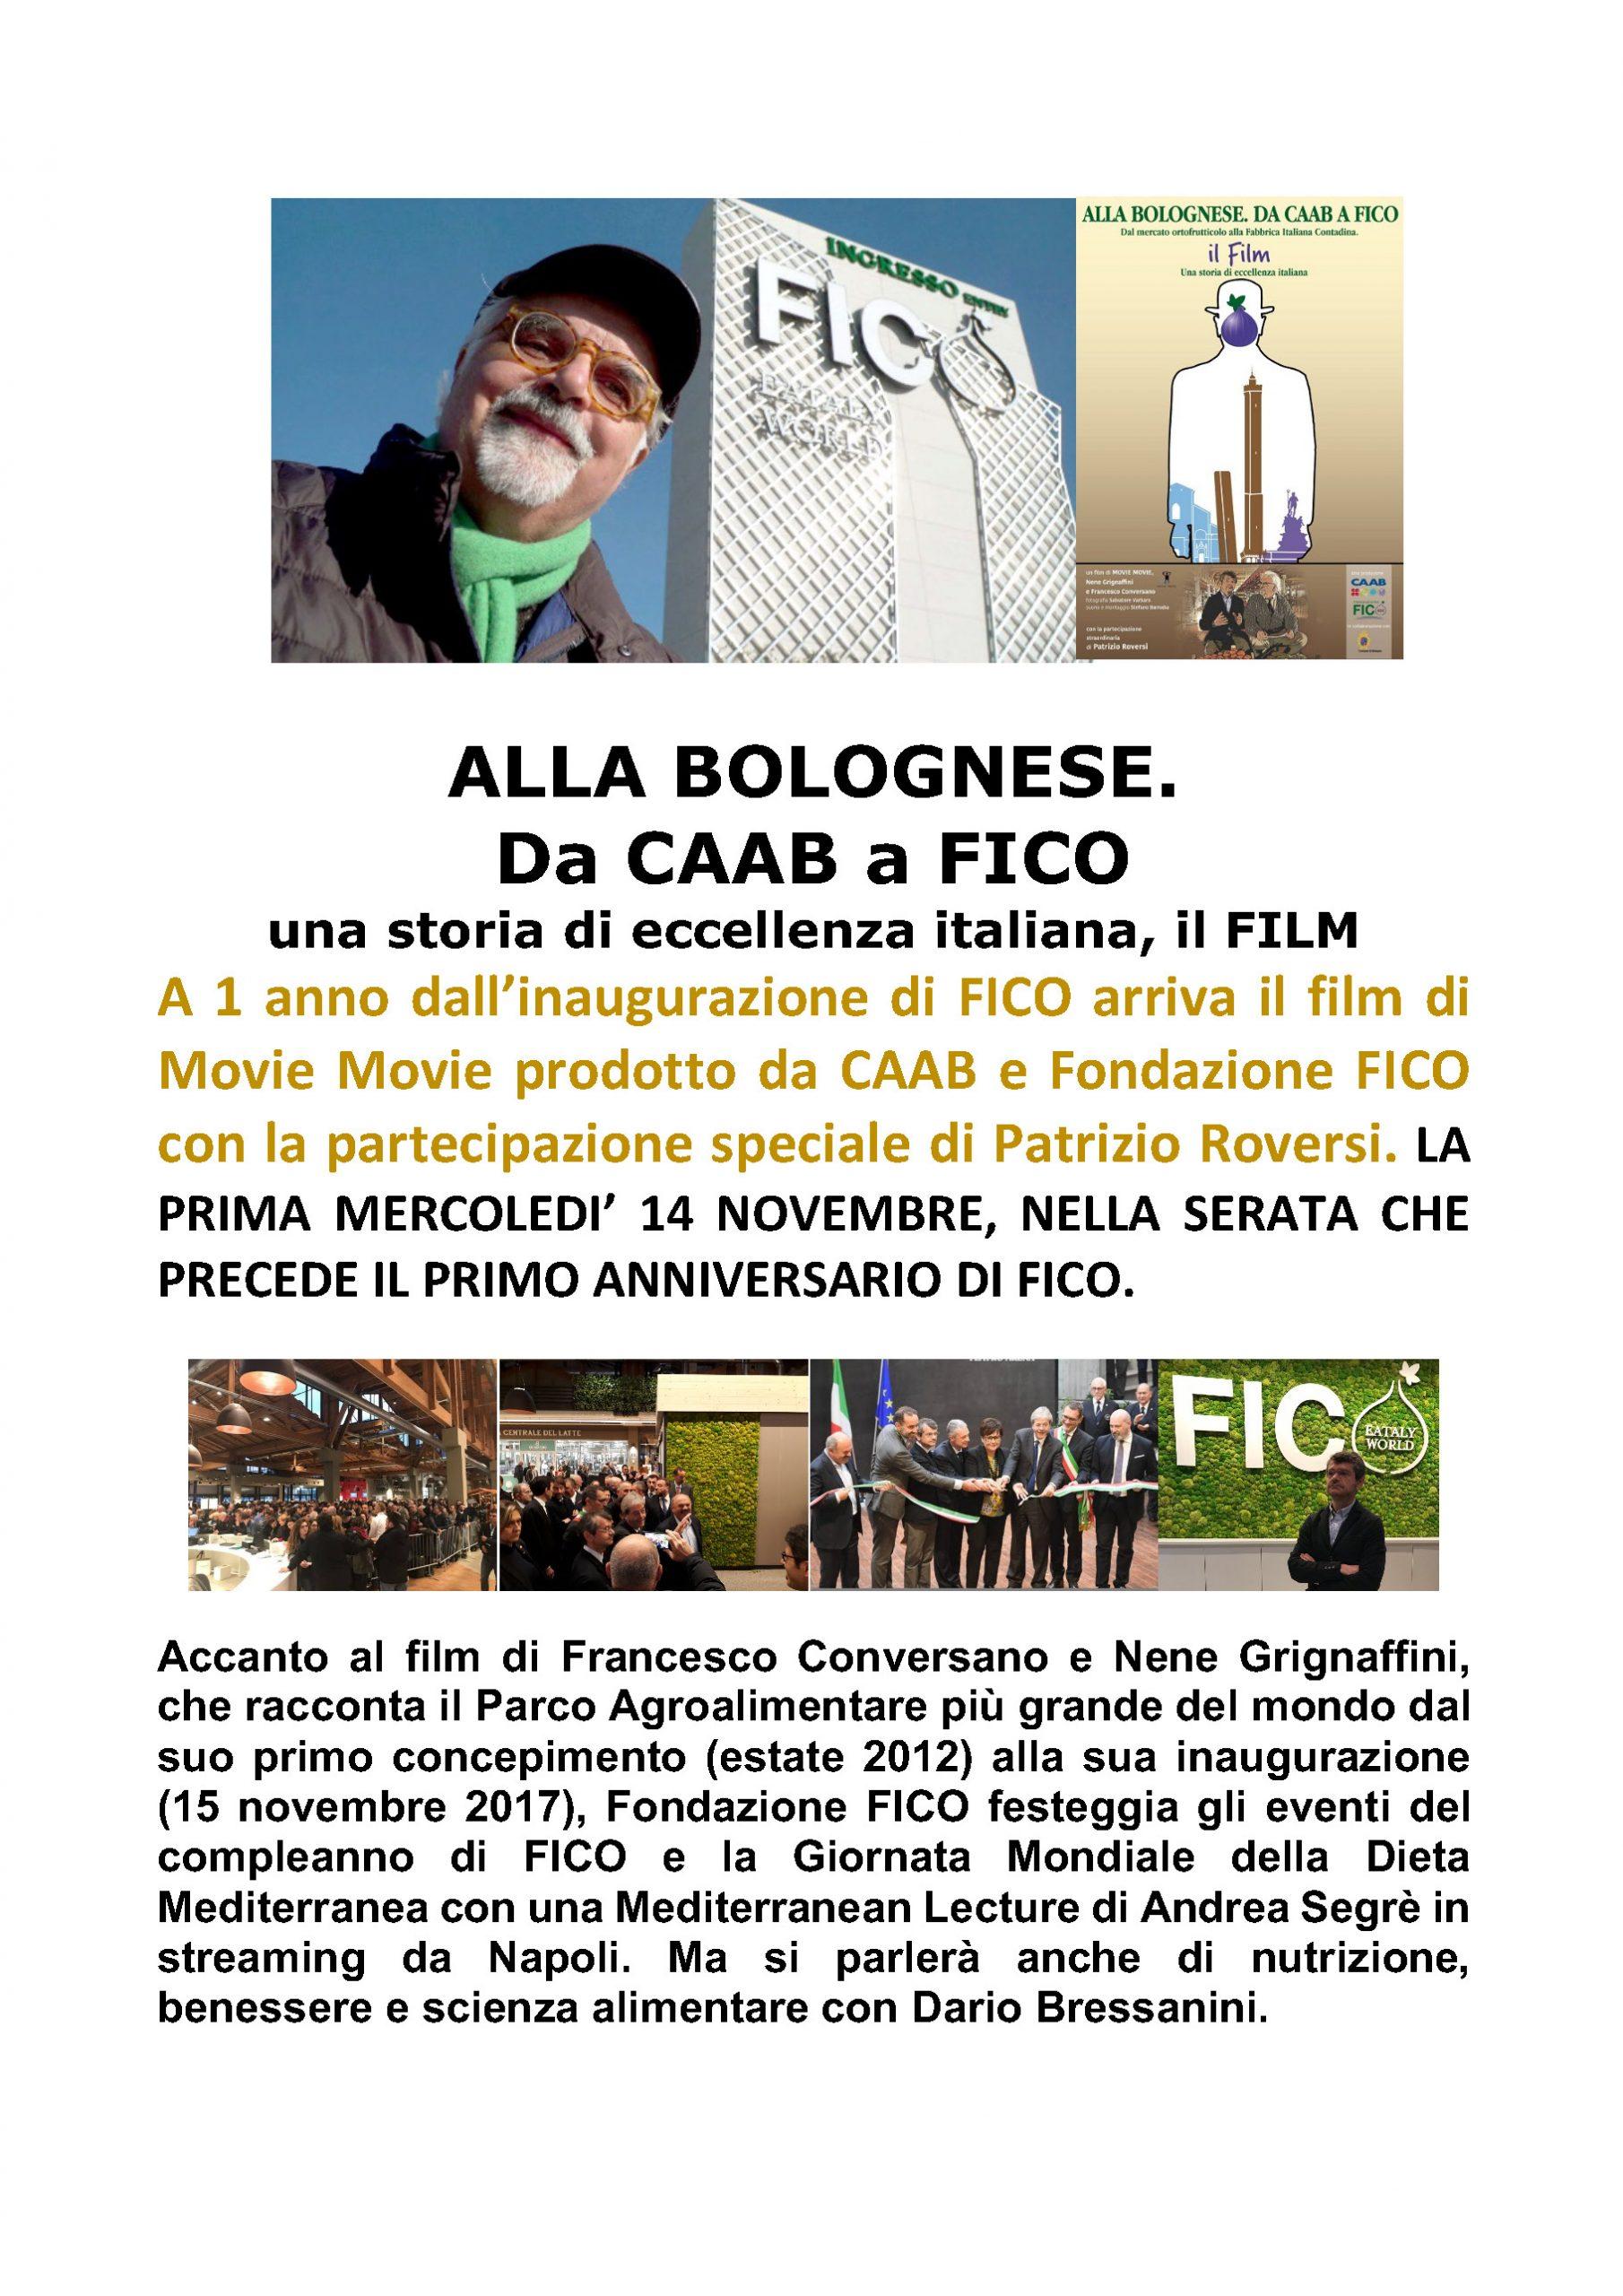 CS-0064-14-11-2018-DA-CAAB-A-FICO_Pagina_1